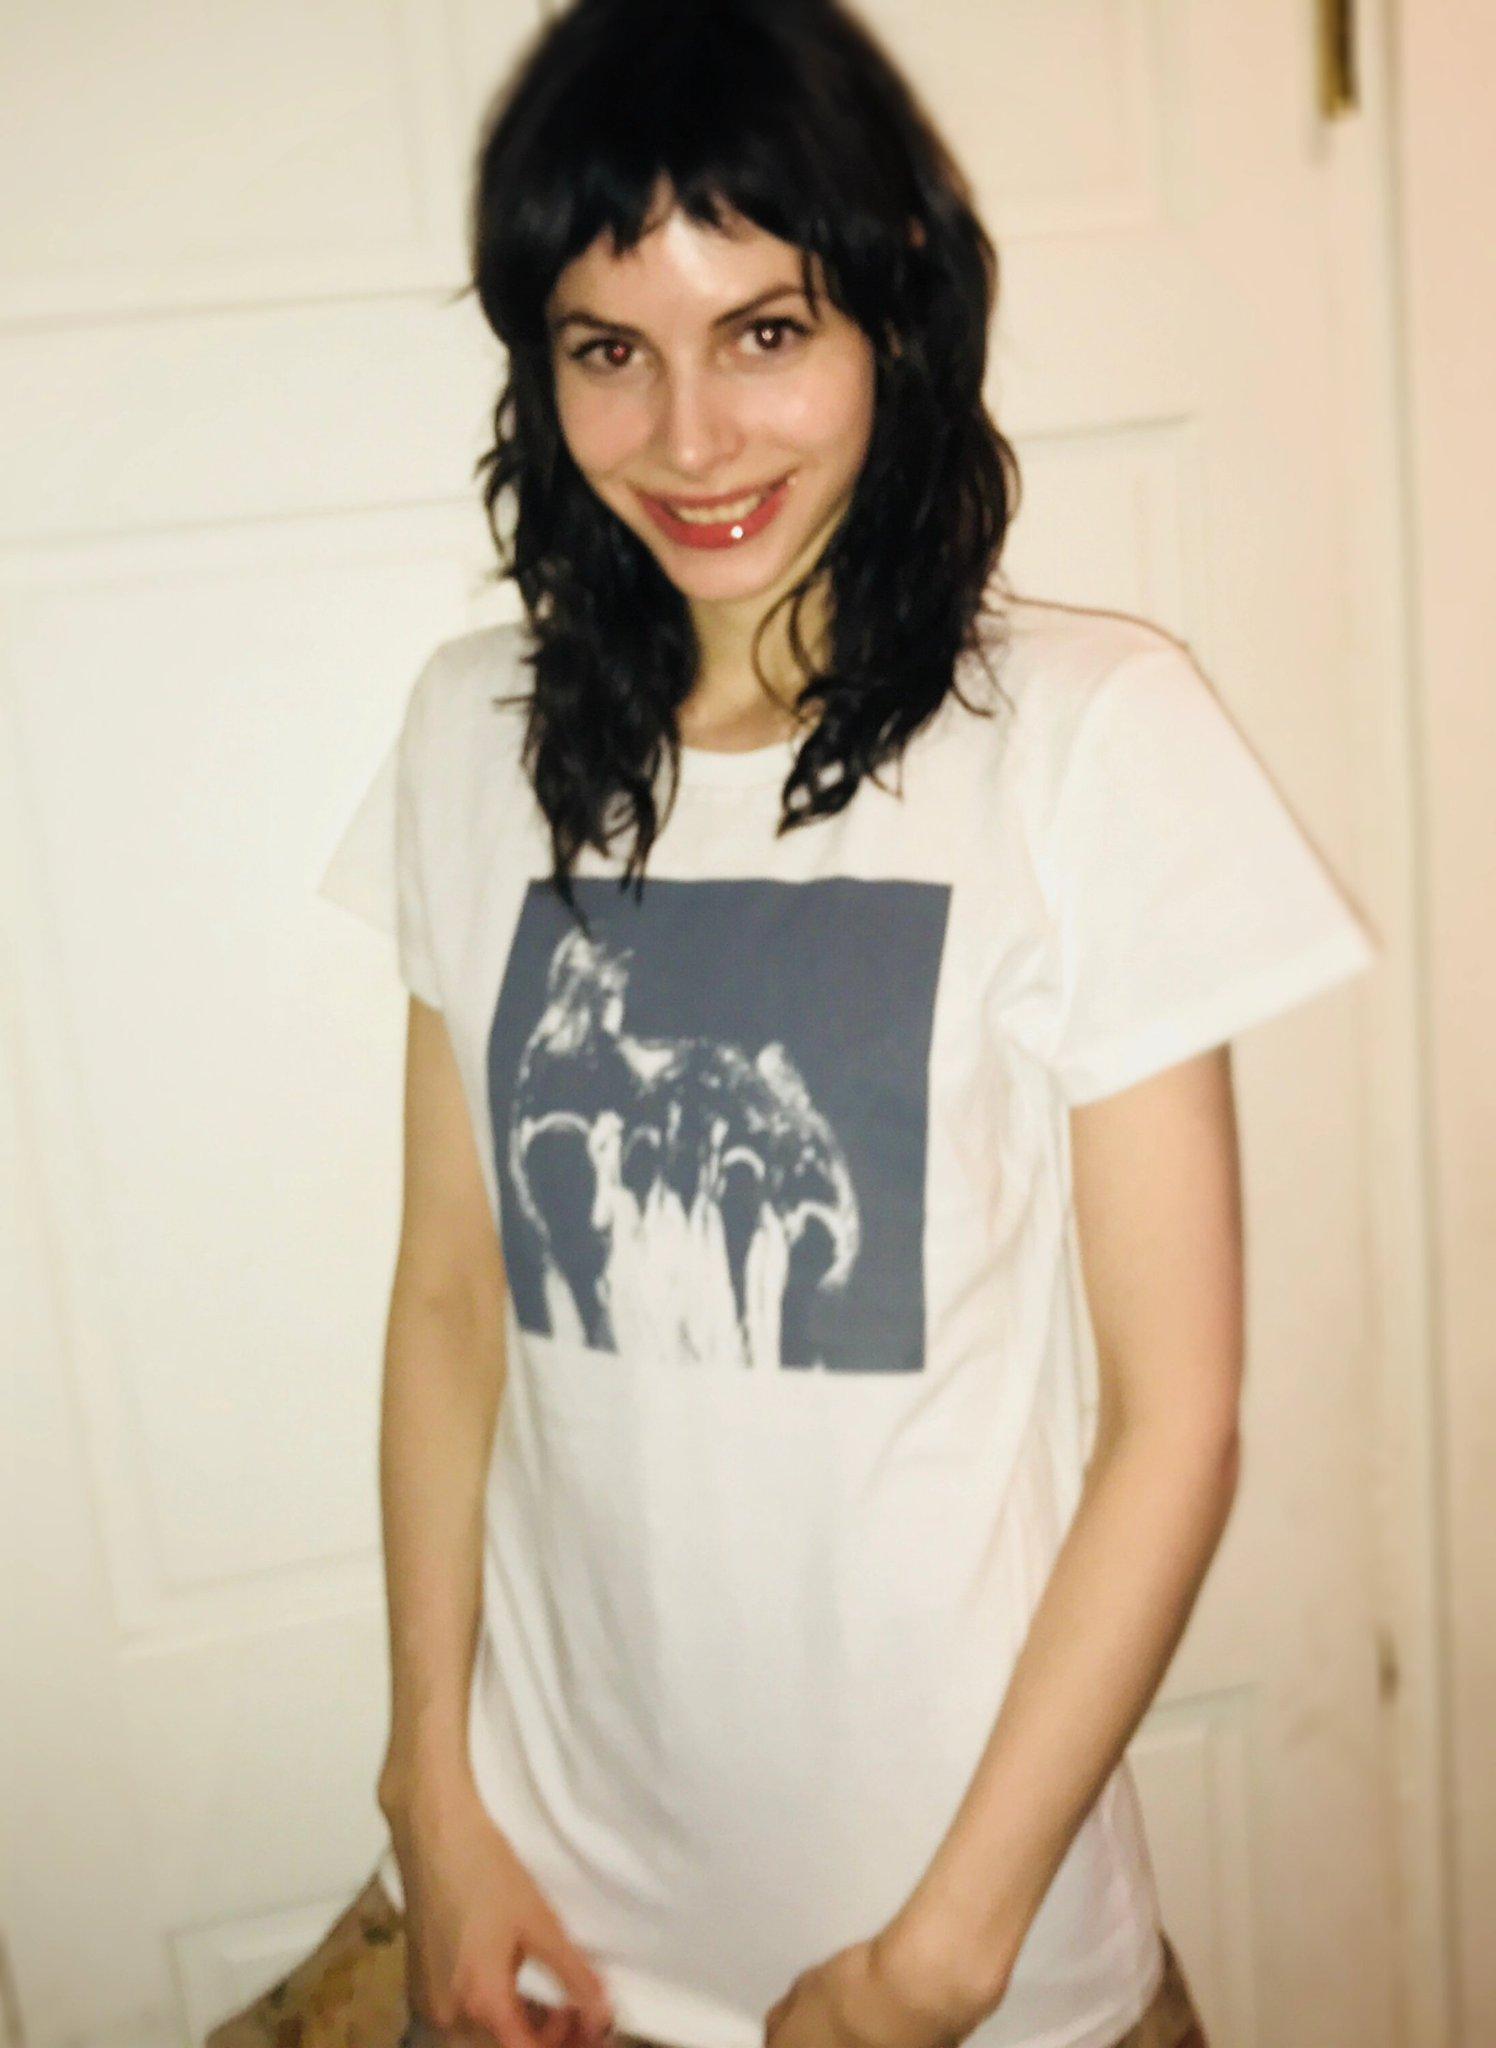 Charlotte Kemp Muhl in the t-shirt I made. https://t.co/xu5GfxA3rn